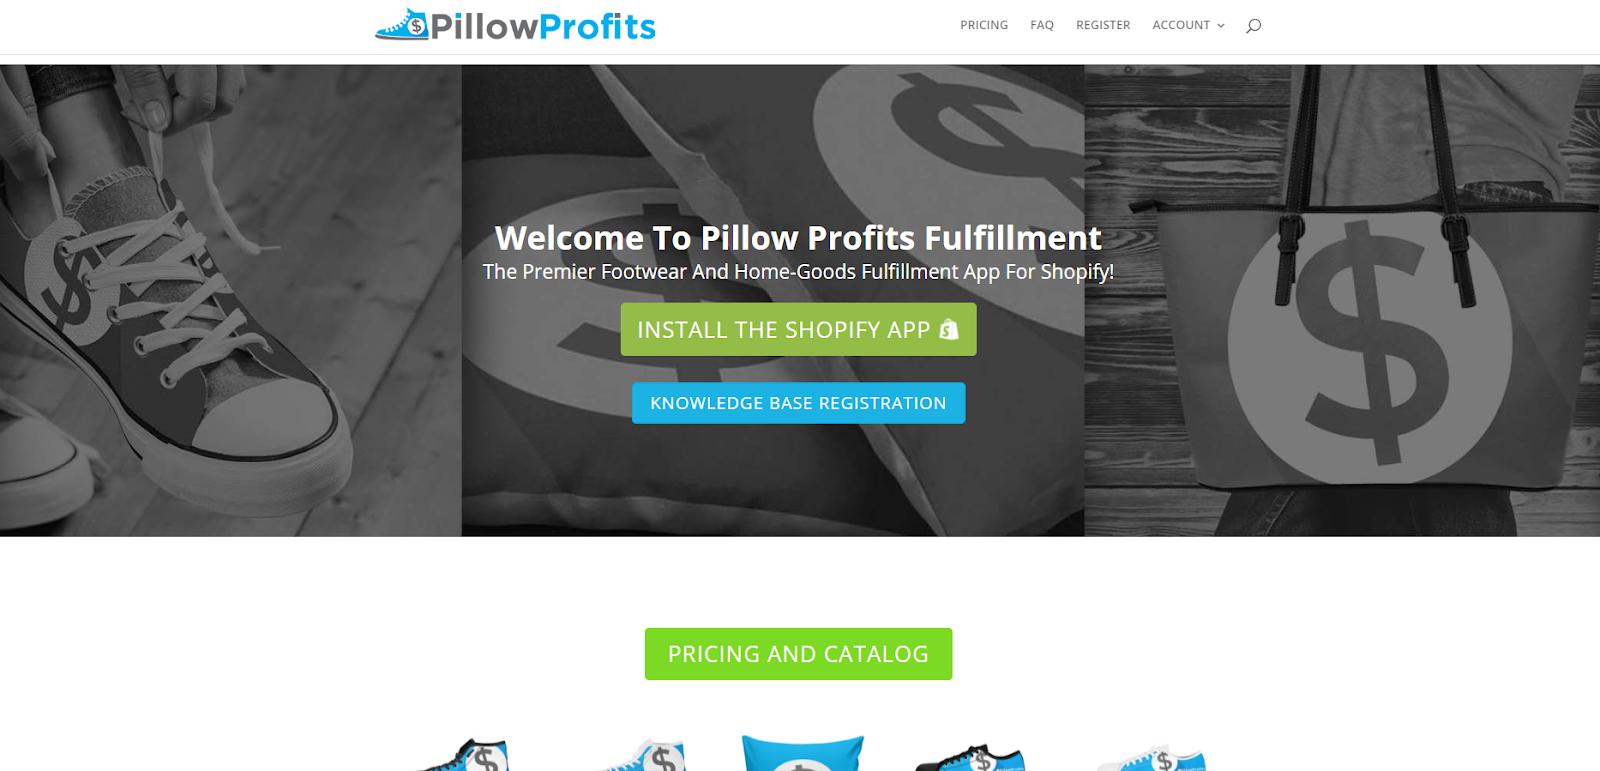 pillow profits dropshipping app